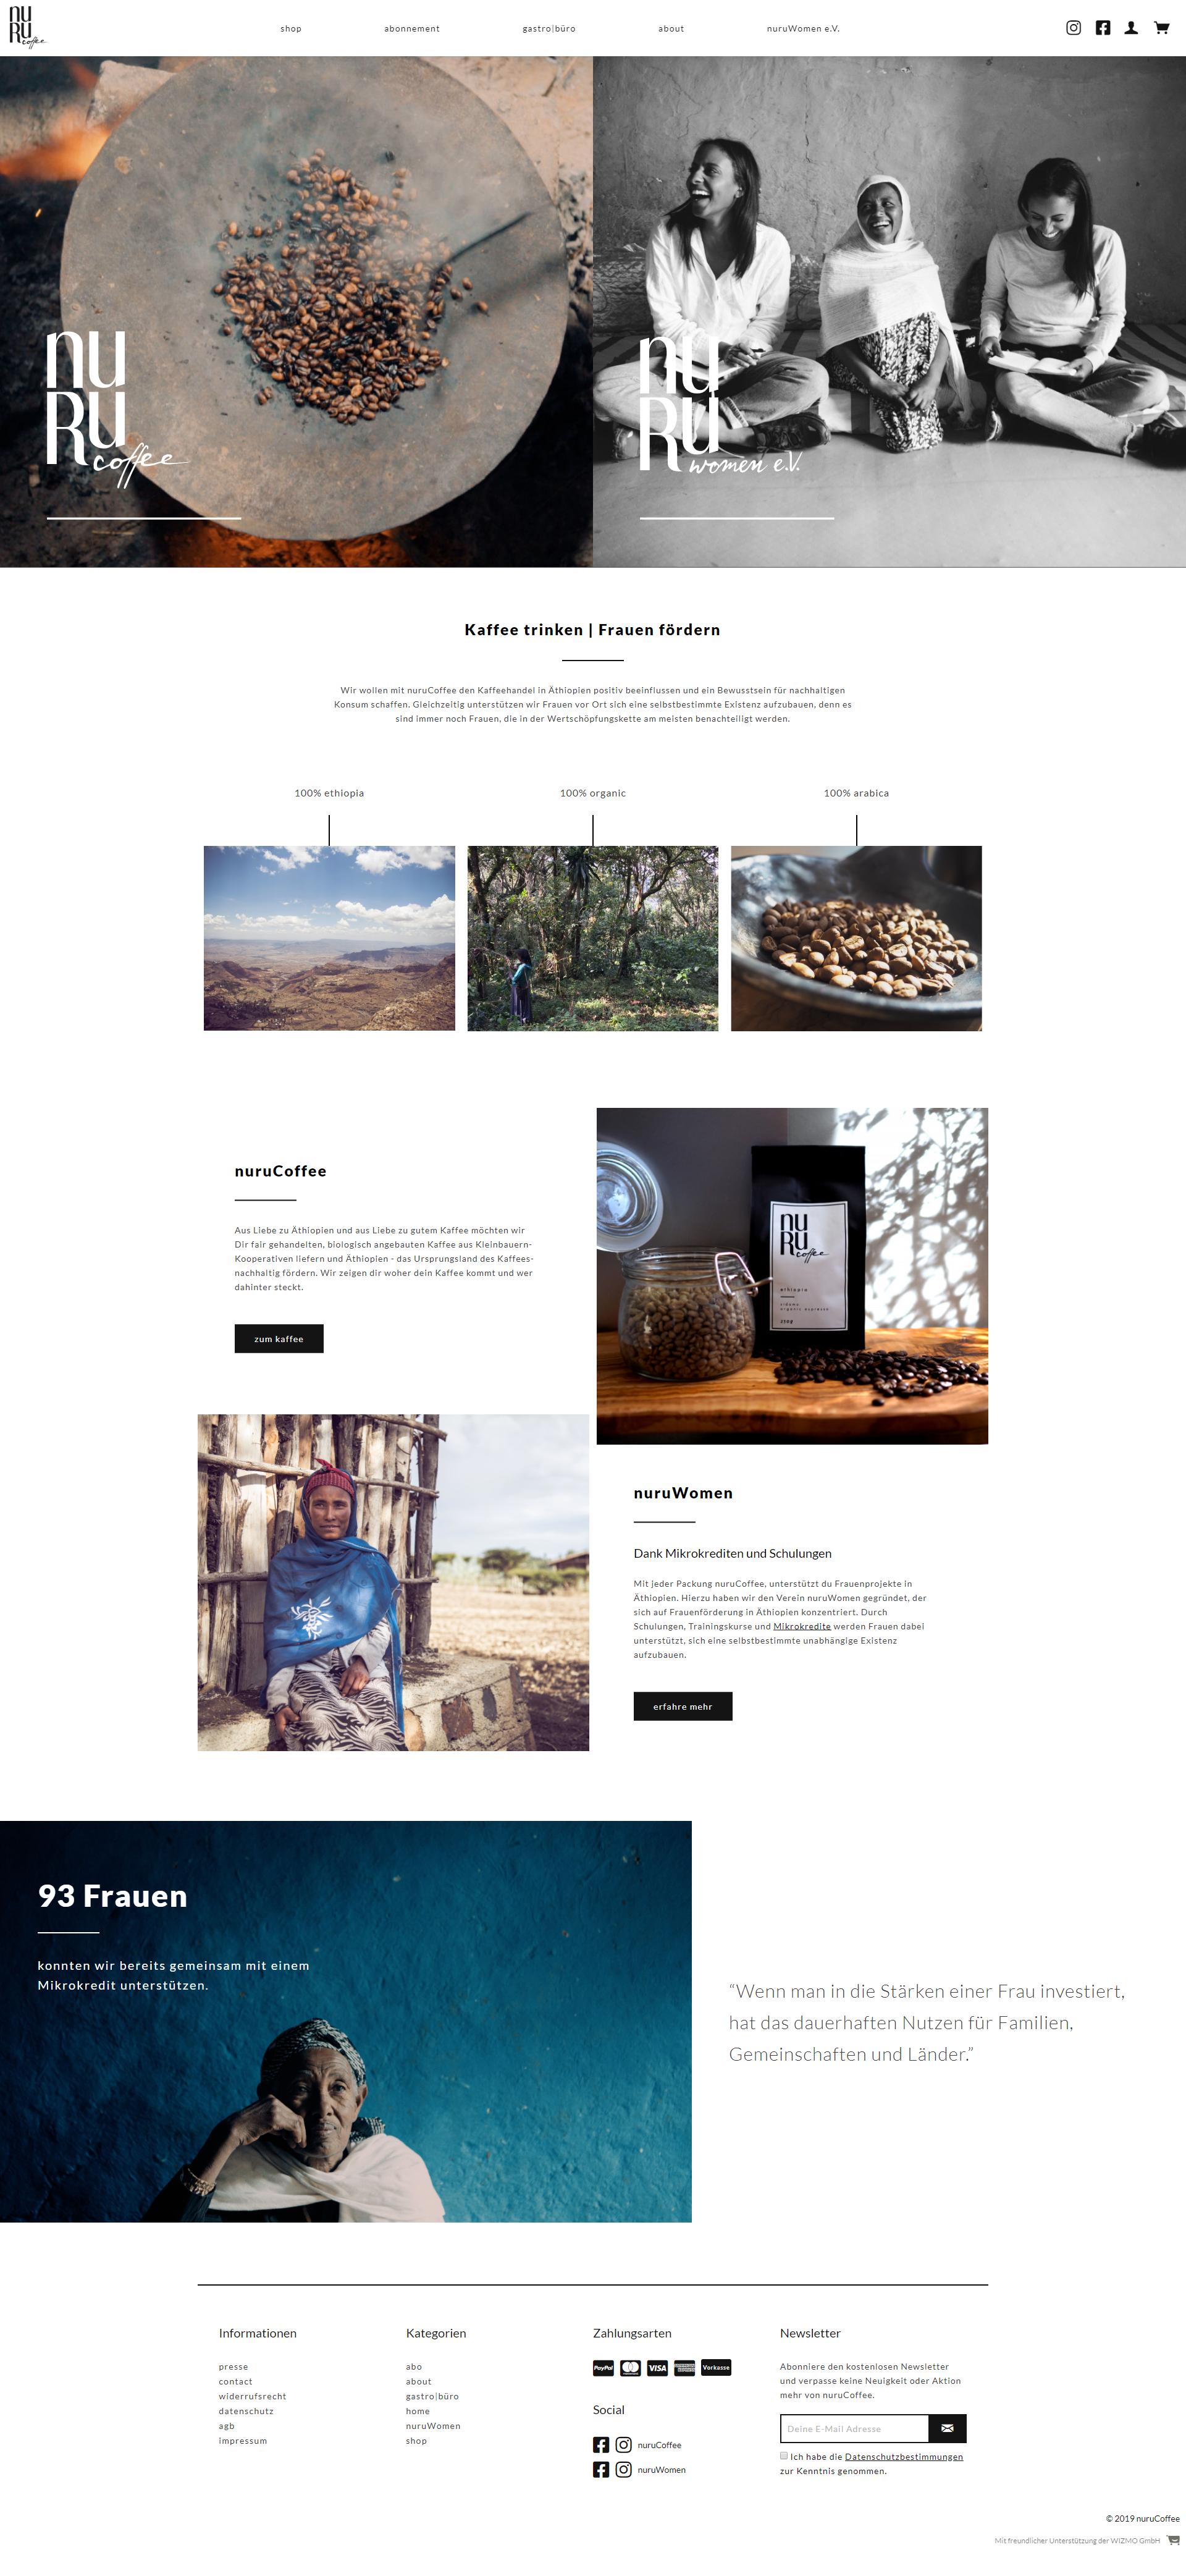 Shopware E Commerce Losungen Fur Jeden Onlineshop Webdesign Web Design Ecommerce